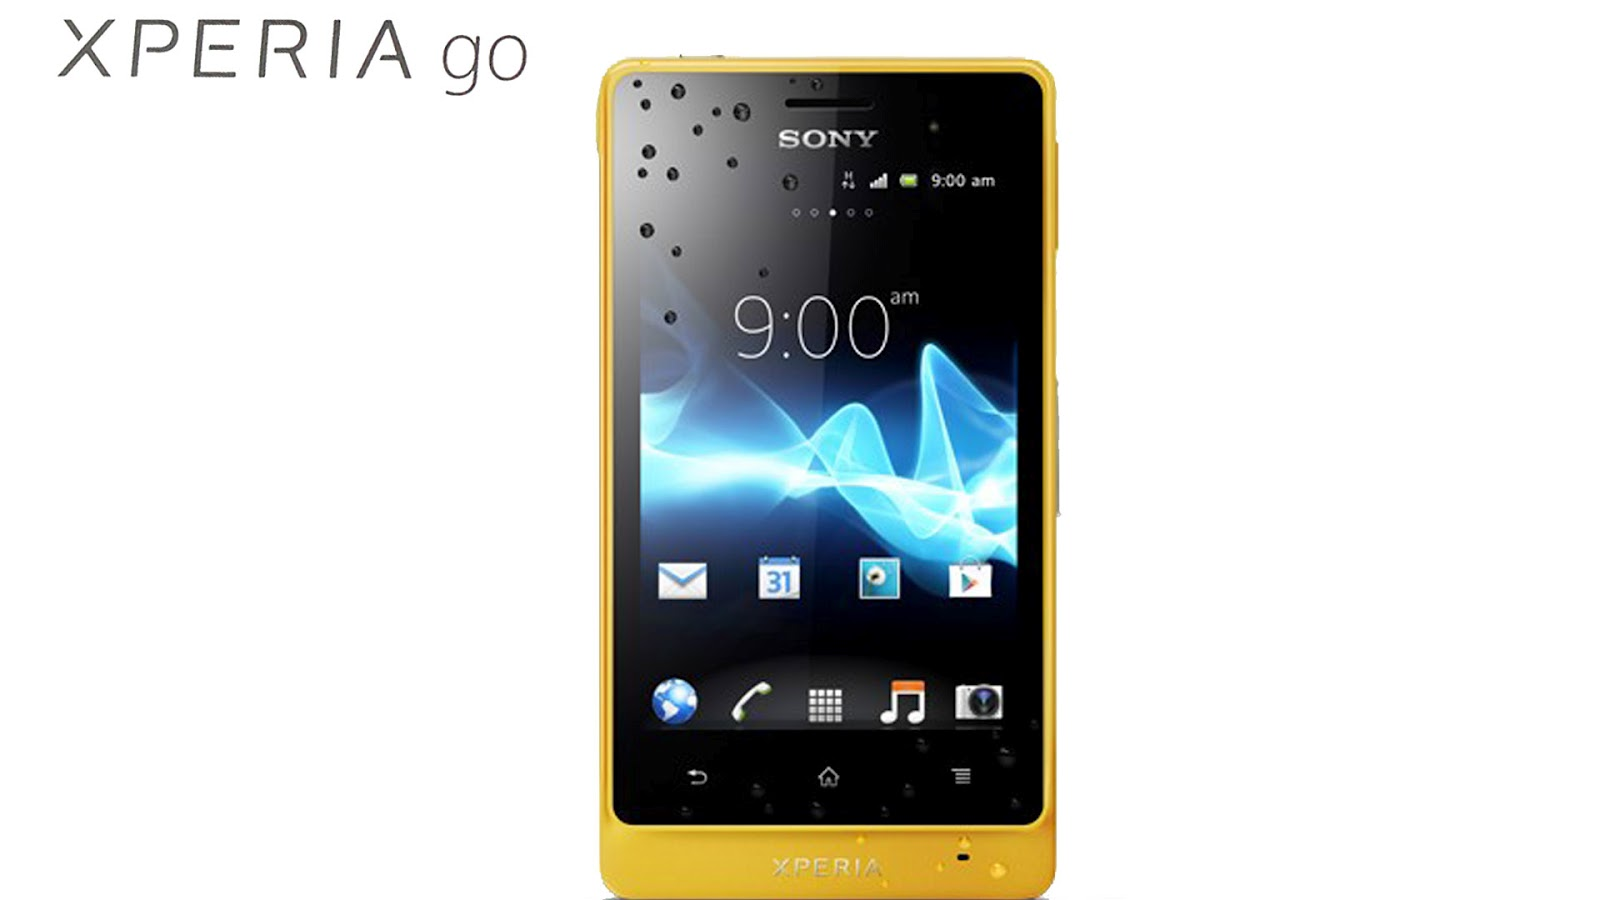 http://3.bp.blogspot.com/-j1FpO54Ffic/UCKfxD2CnsI/AAAAAAAAFI8/gfbEgNTklr8/s1600/Sony+Xperia+Go.jpg